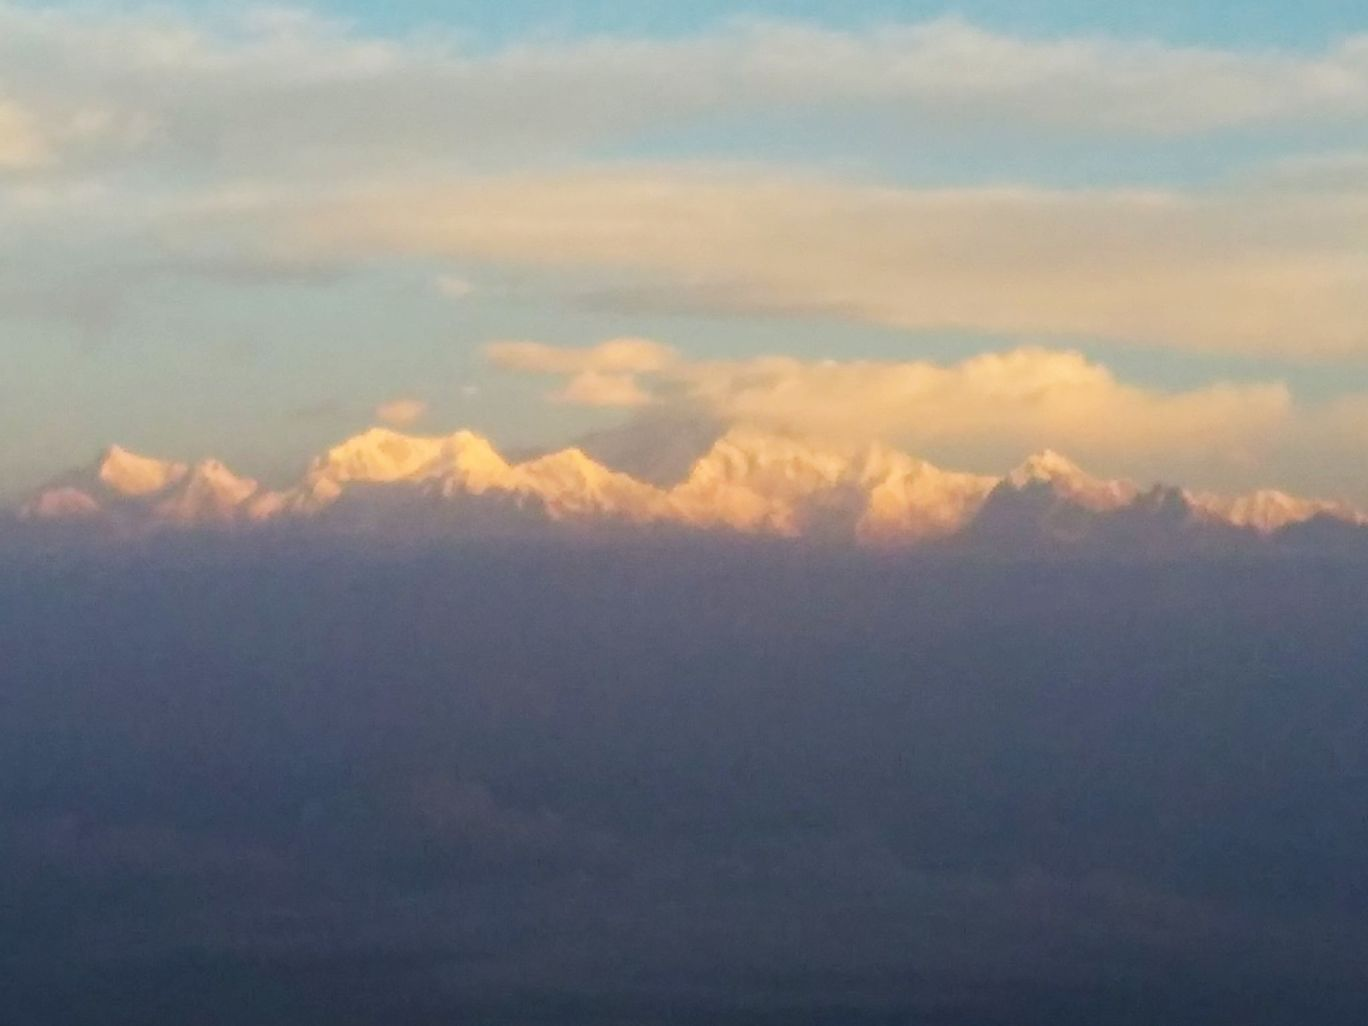 Photo of Darjeeling By Ashar Najeeb